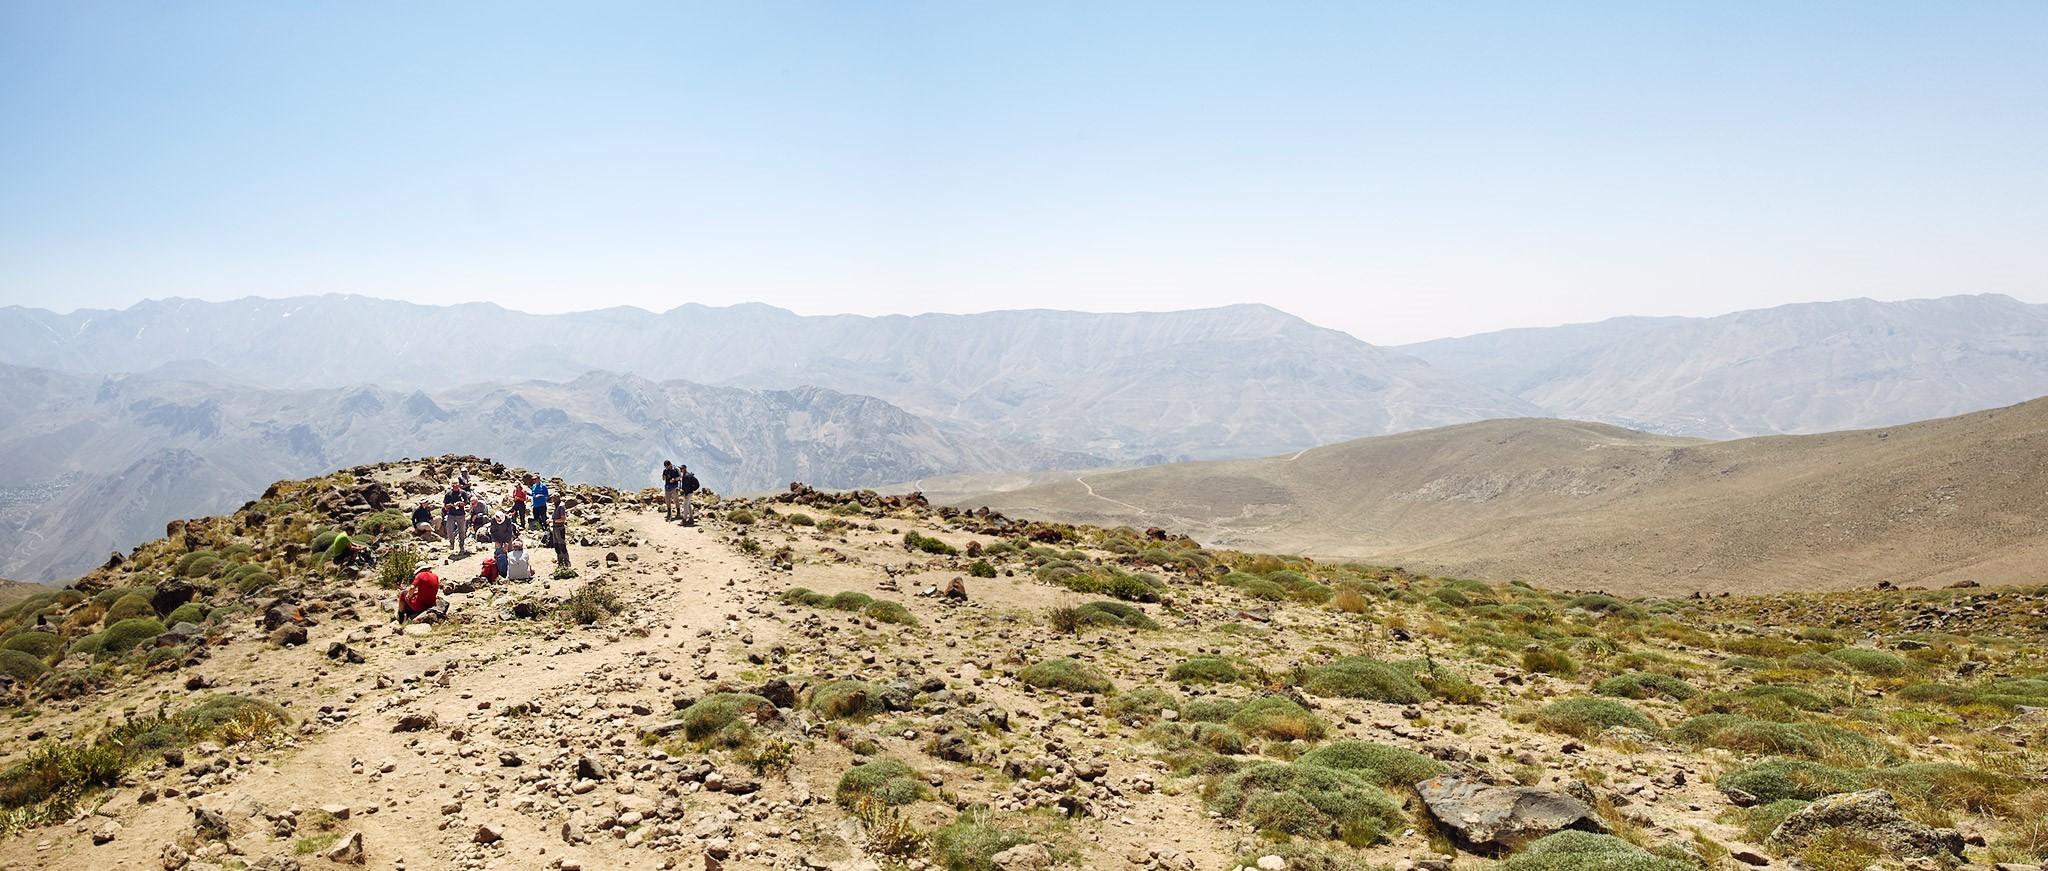 Albroz Mountain Range, Iran